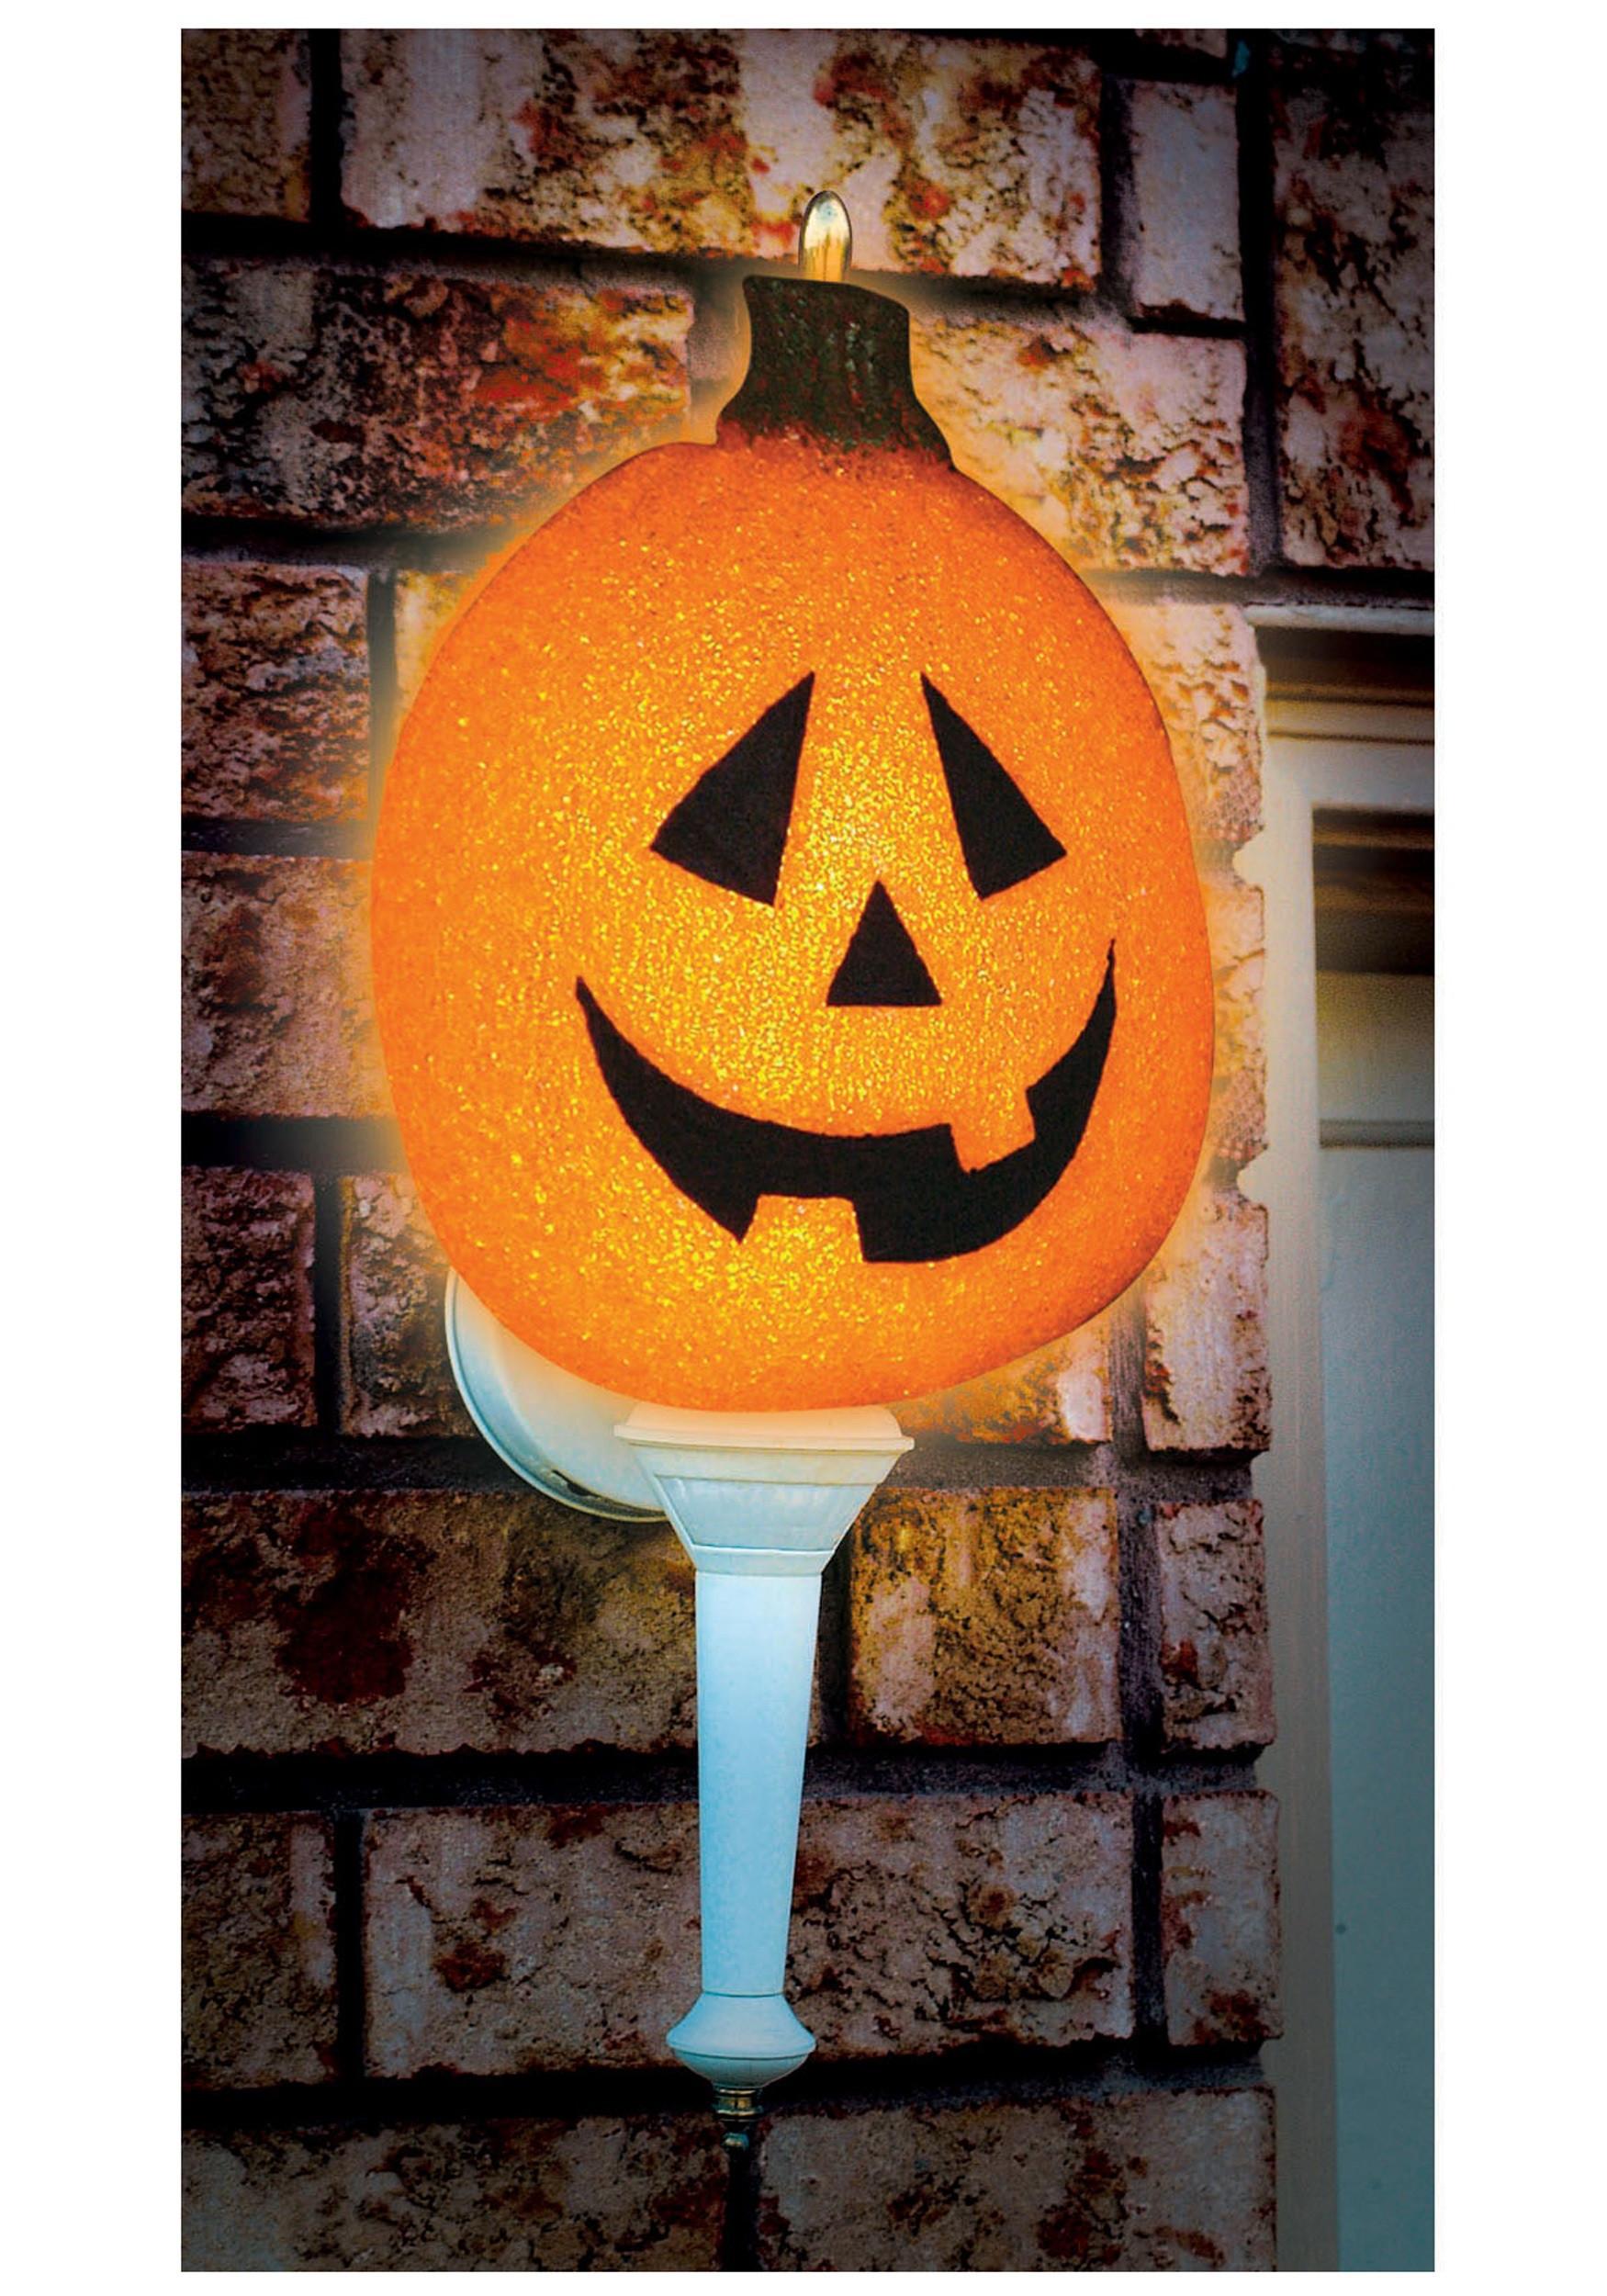 Halloween Lamp Shade Covers  Sparkling Pumpkin Porch Light Cover Outdoor Halloween